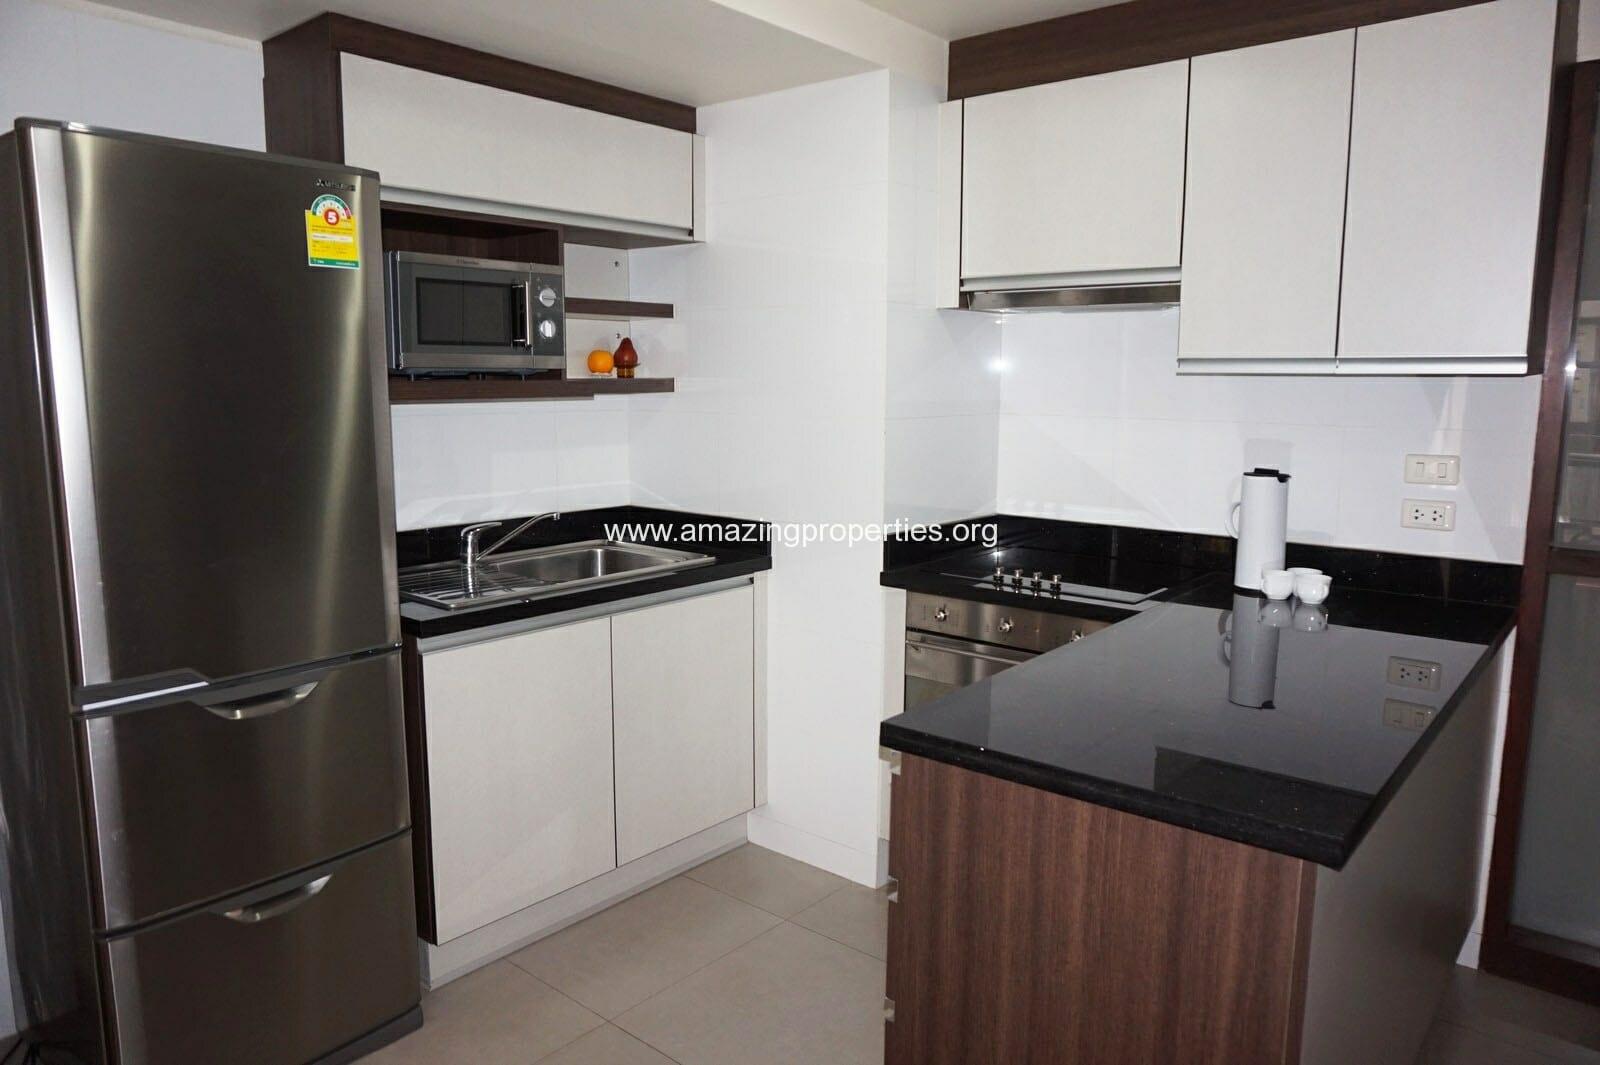 2 bedroom Baan Sukhumvit 14-1